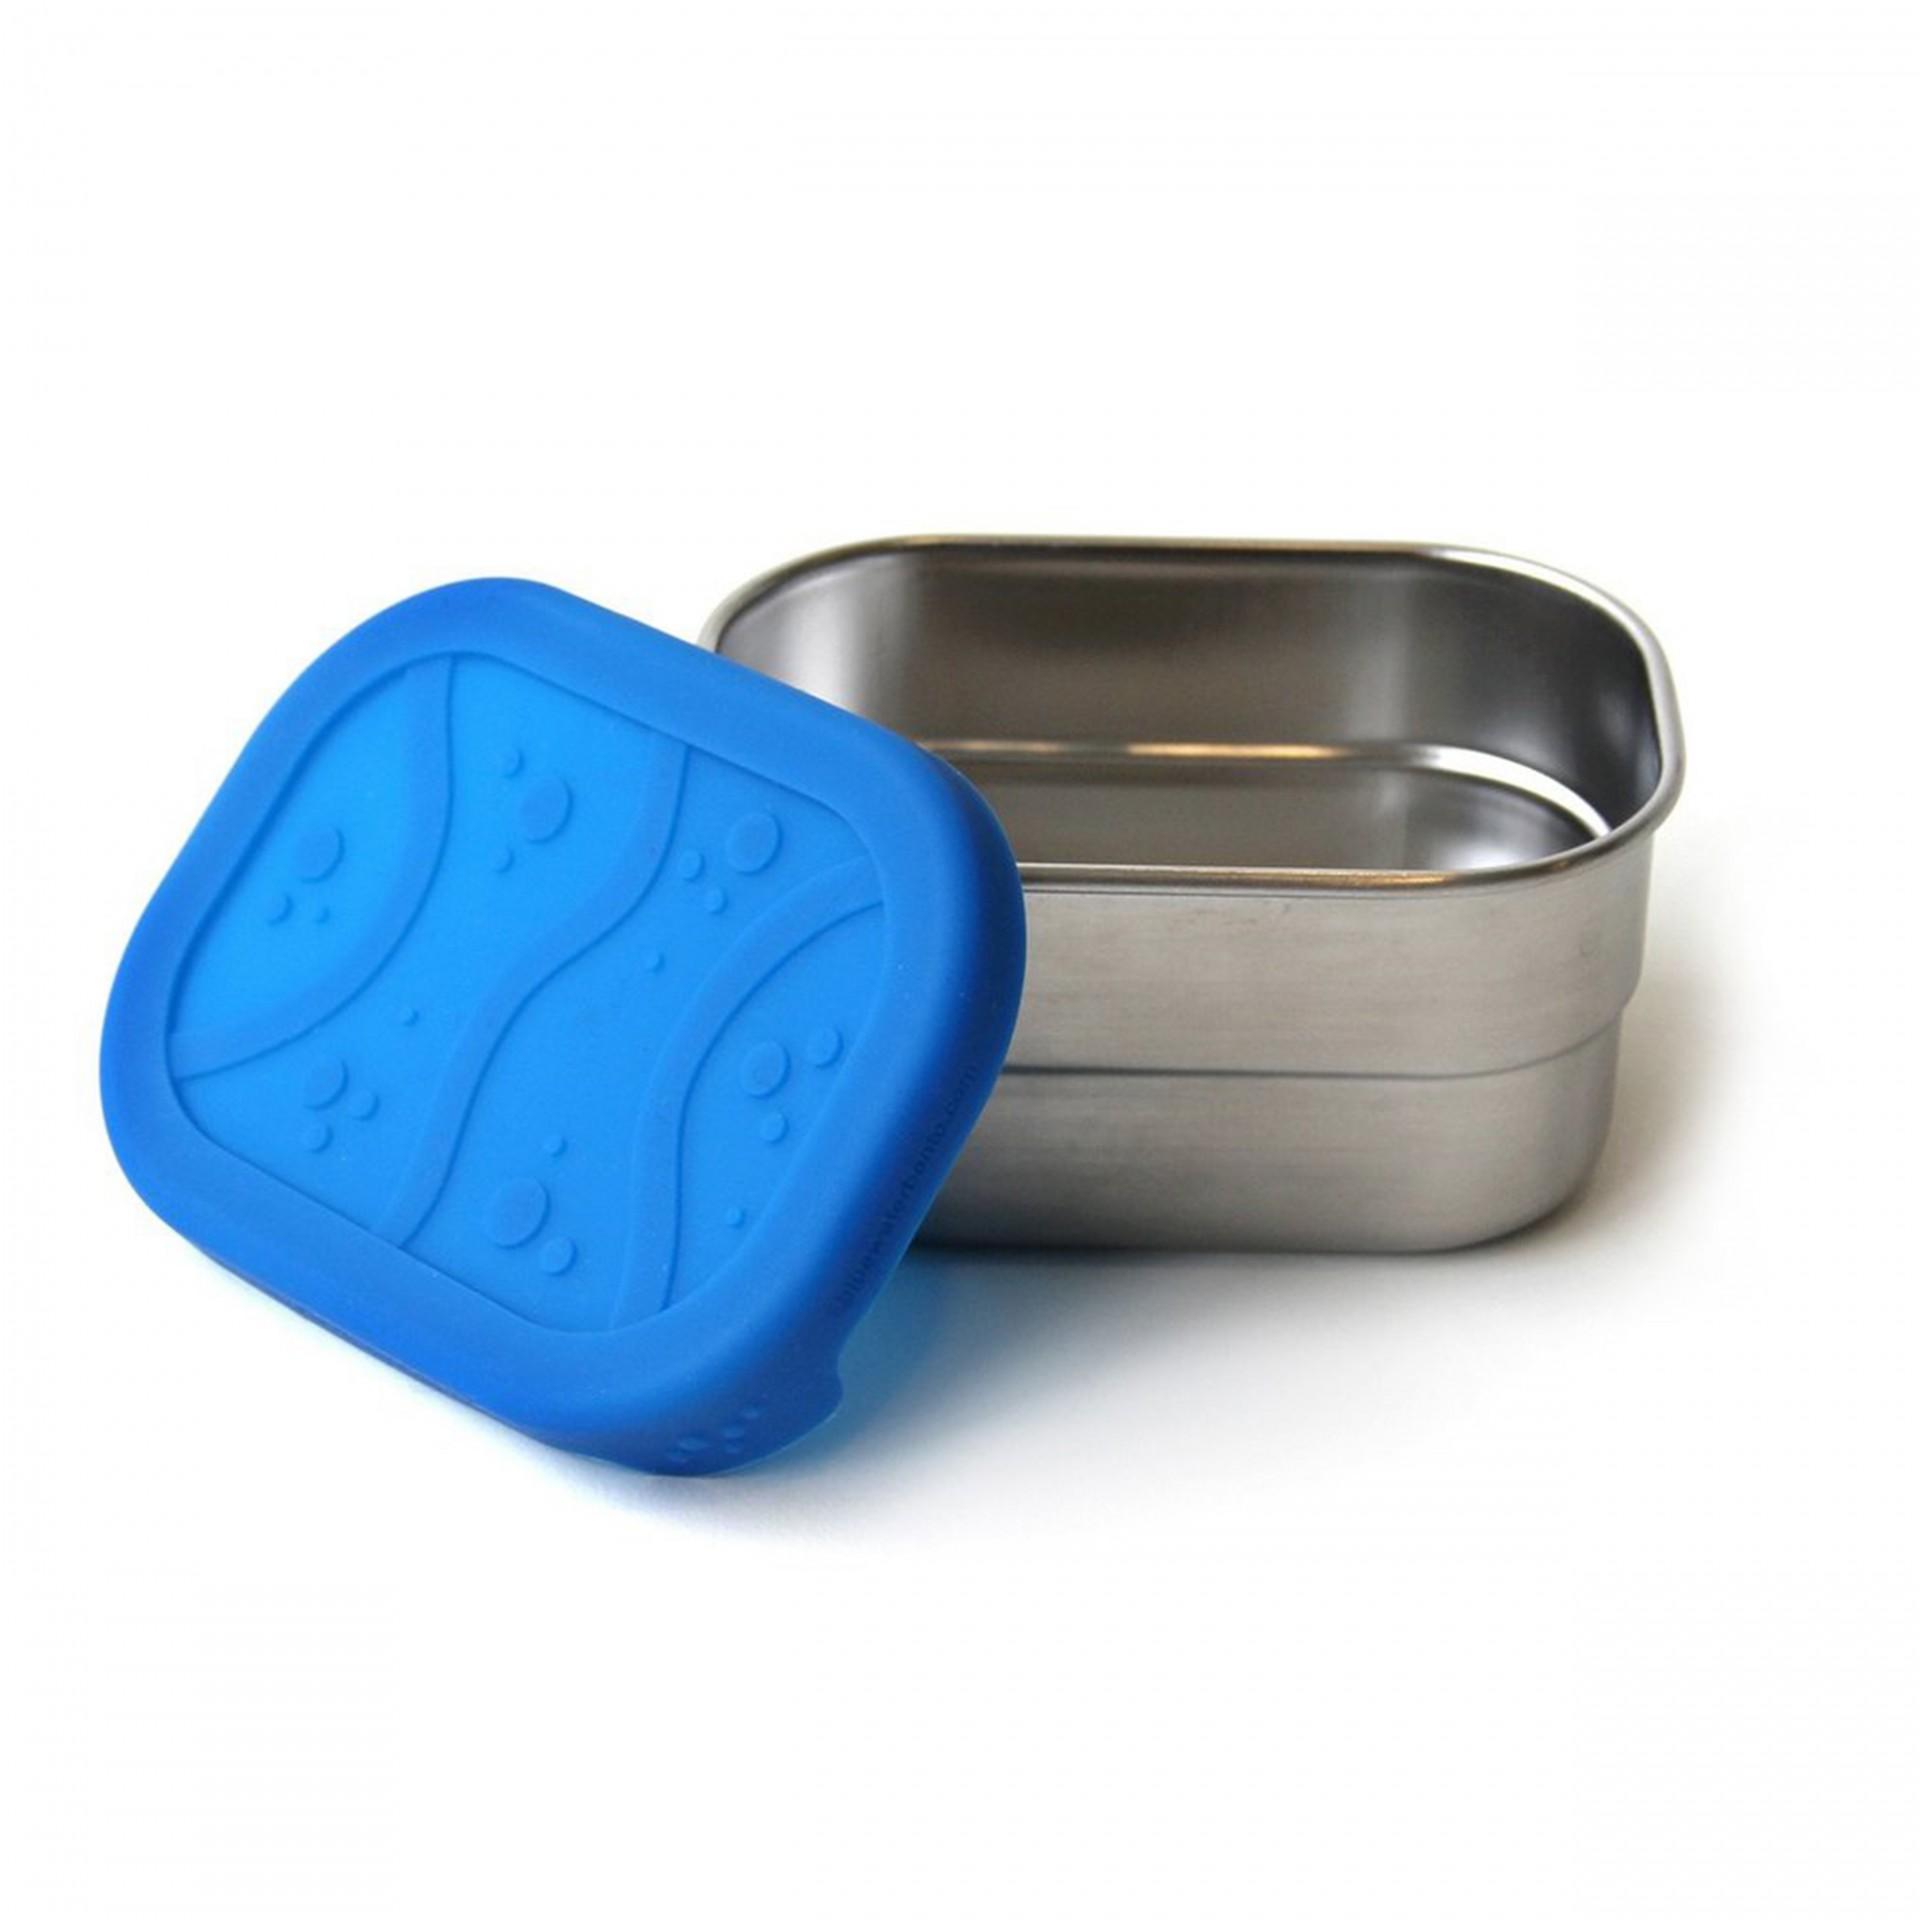 Marmita Splash Pod Blue Water Bento